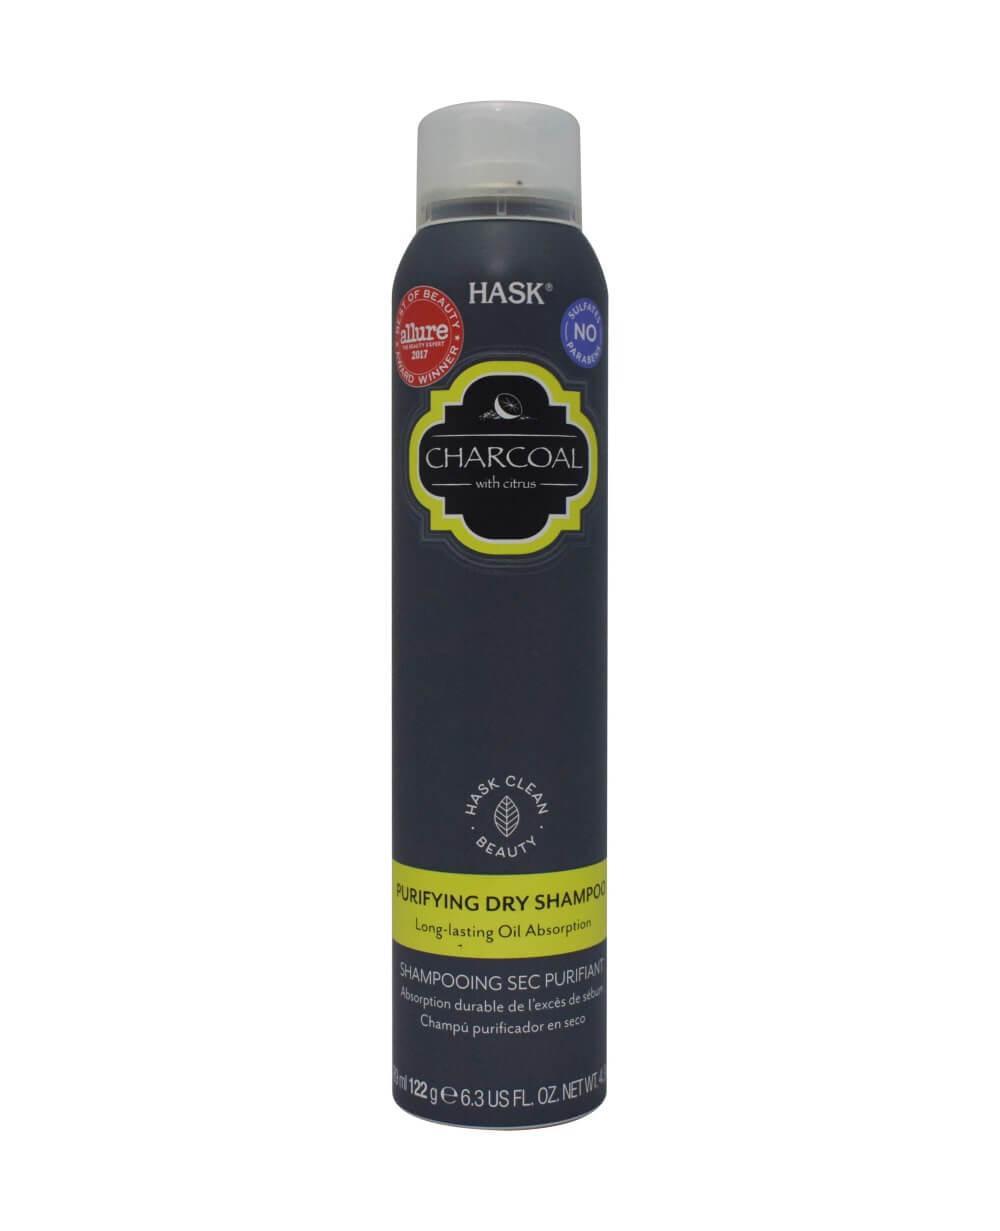 Hask Charcoal Purifying Dry Shampoo 122g